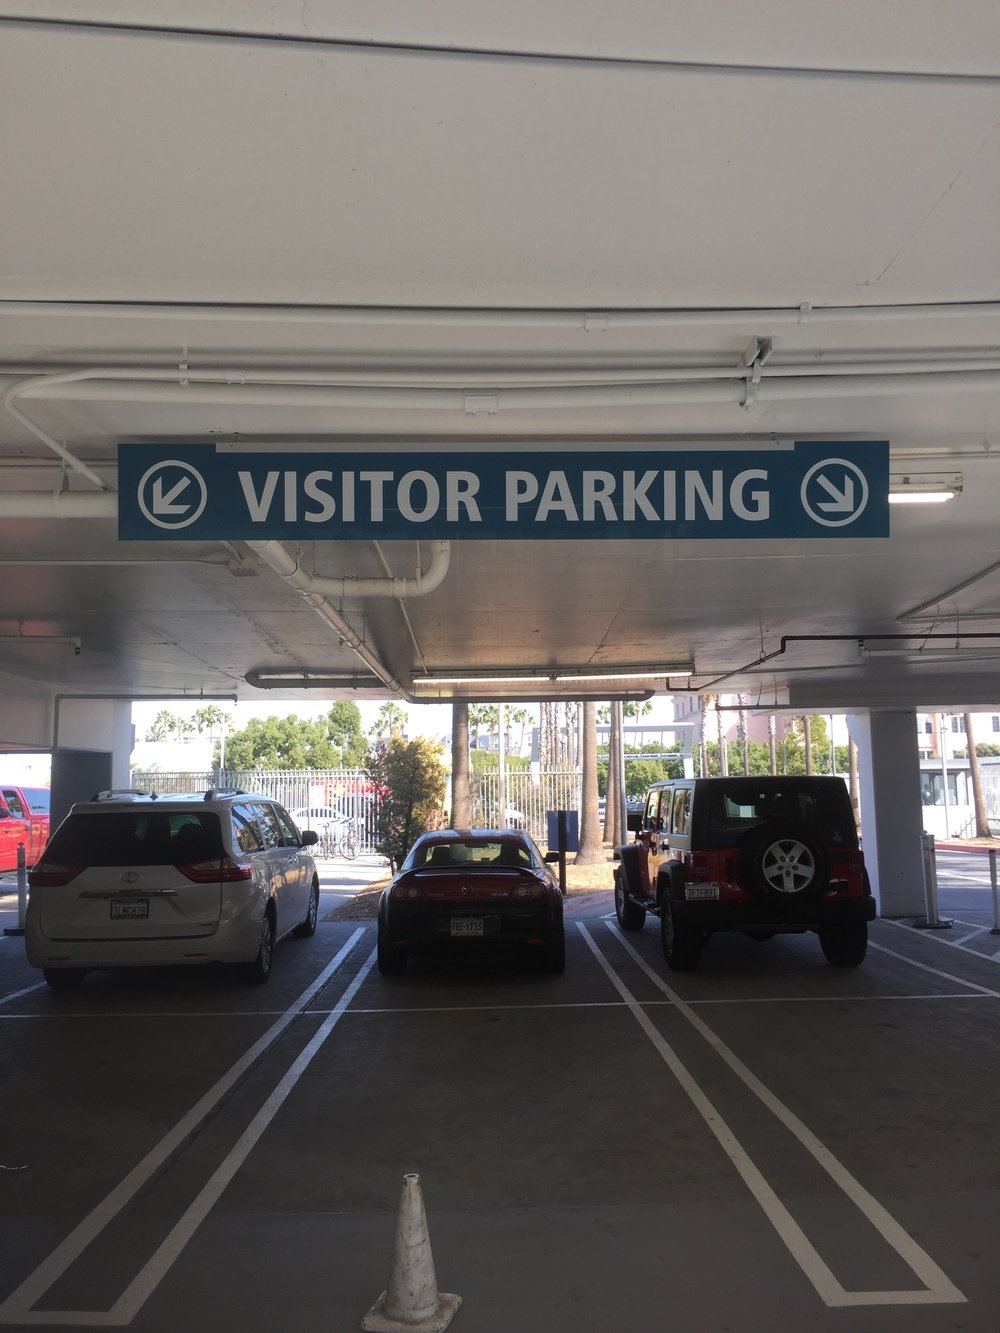 Visitor Parking Directional Sign